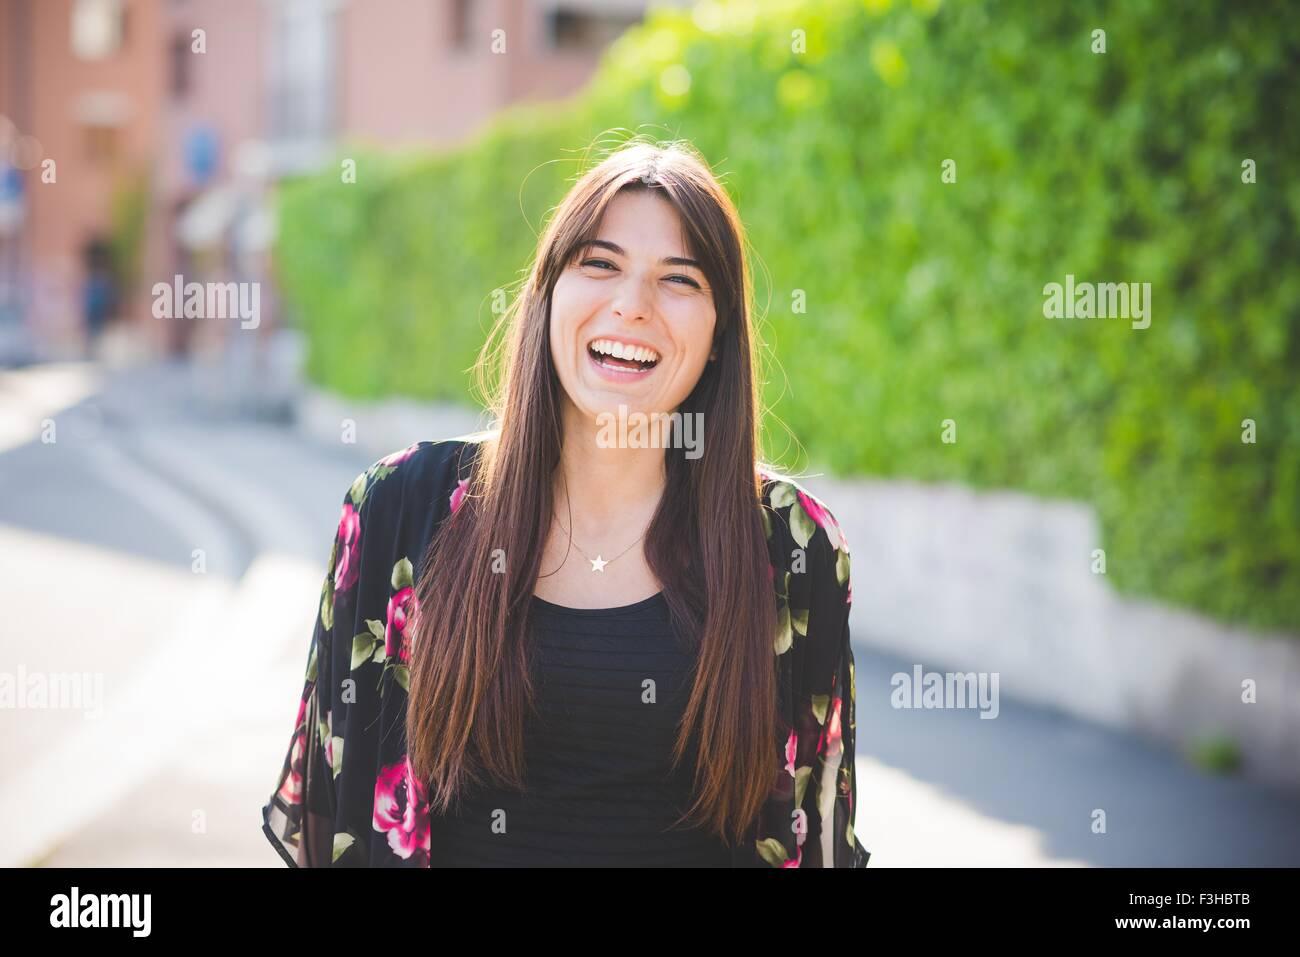 Porträt der jungen Frau mit langen braunen Haaren lachen Stockbild